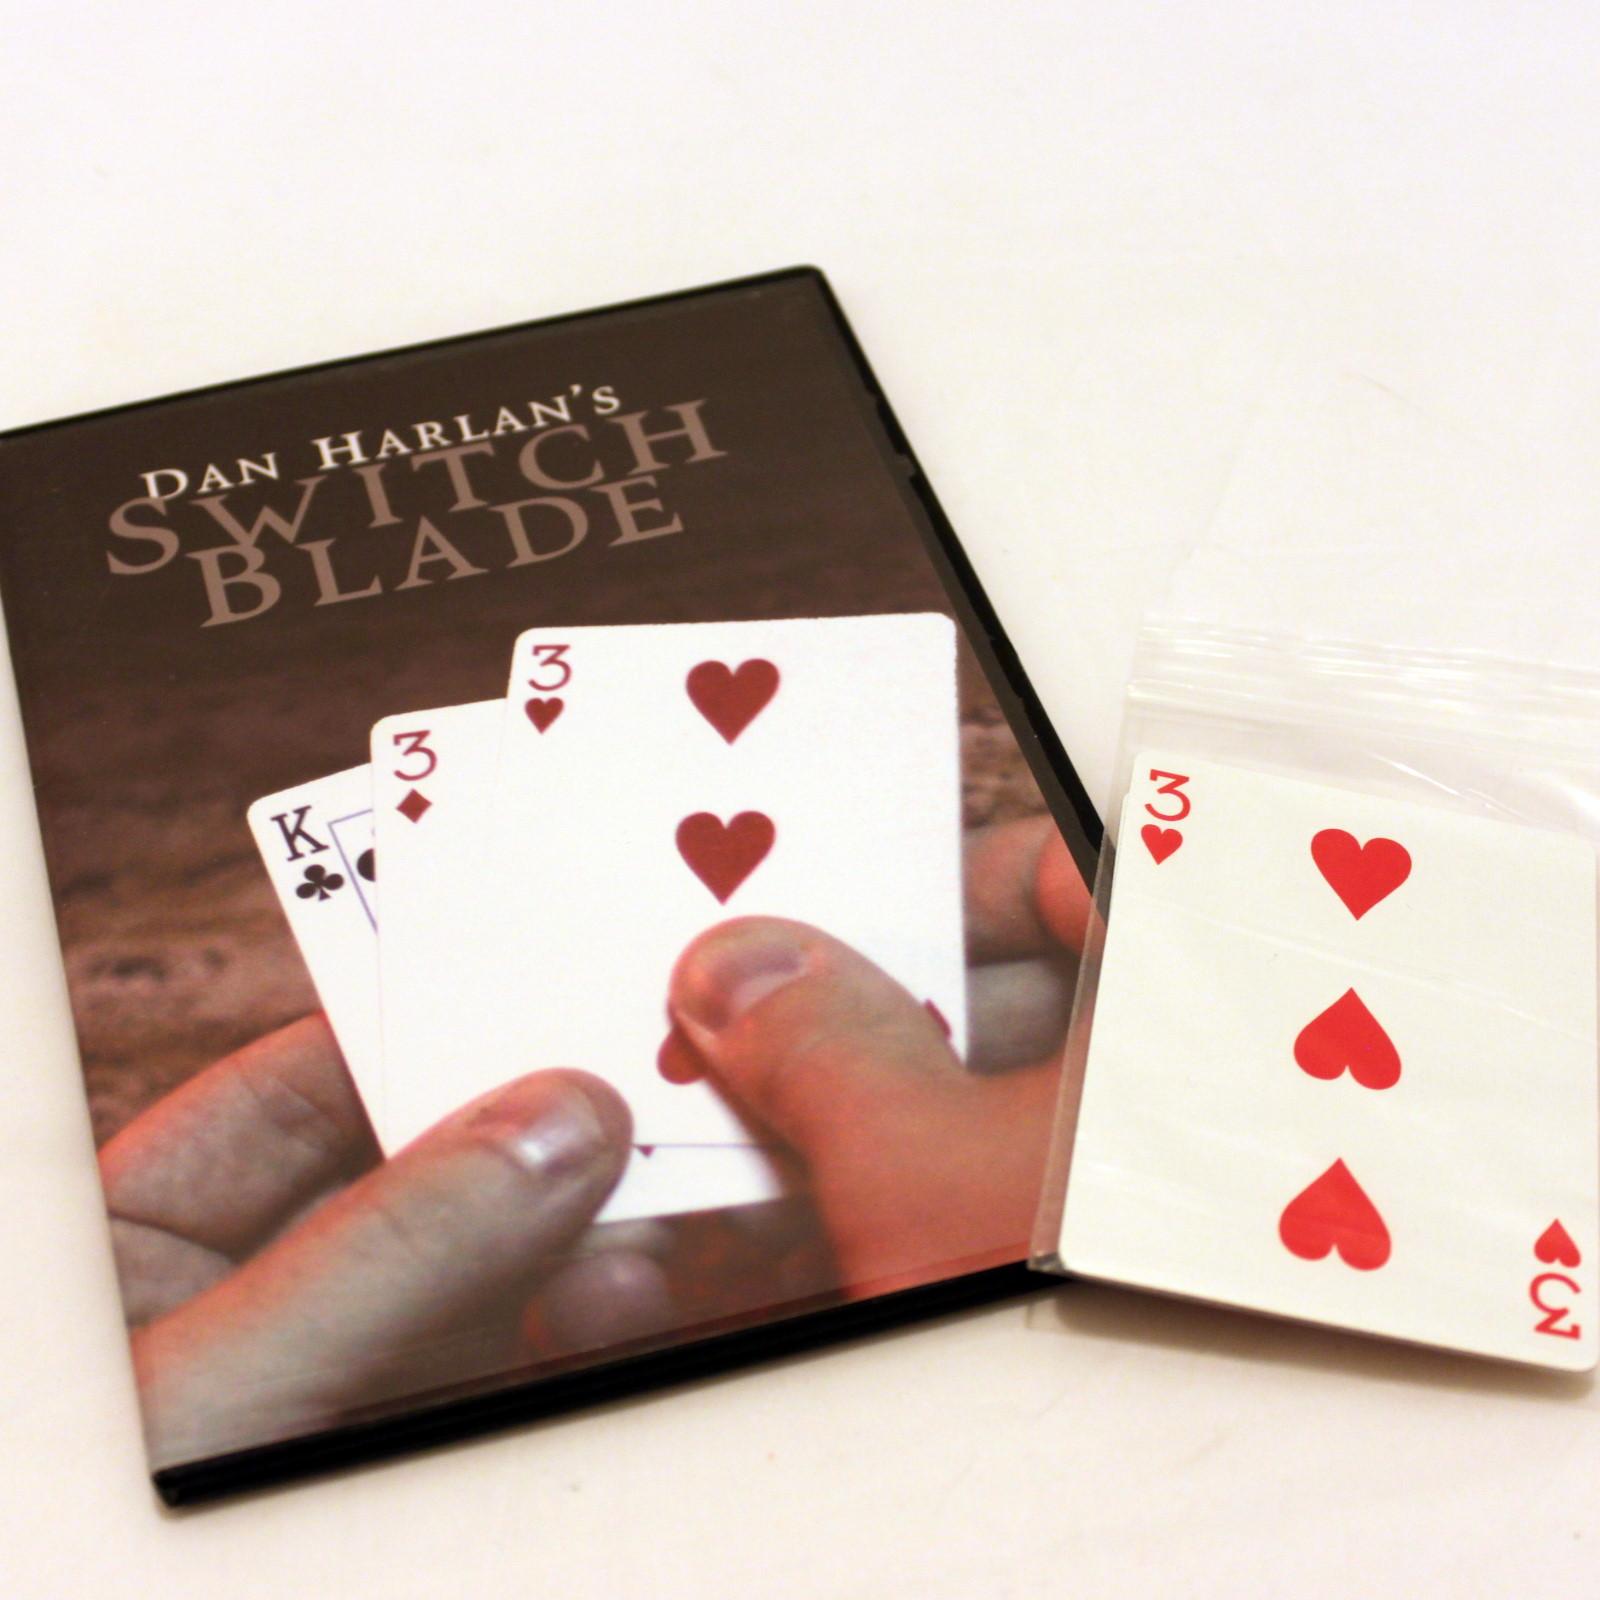 Switch Blade by Dan Harlan